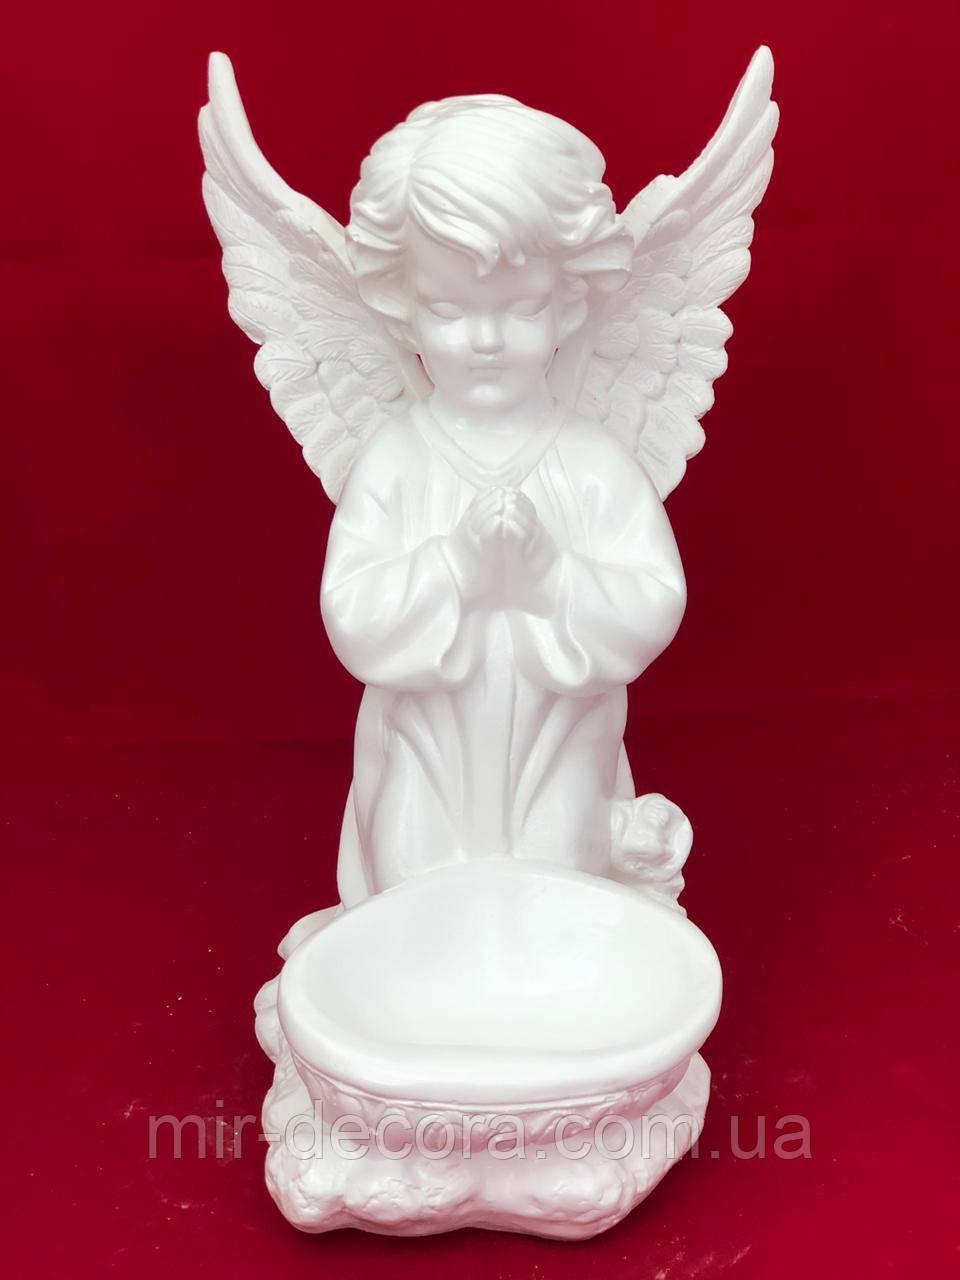 Интерьерная статуэтка Ангел чаша низ, белый, 35 см